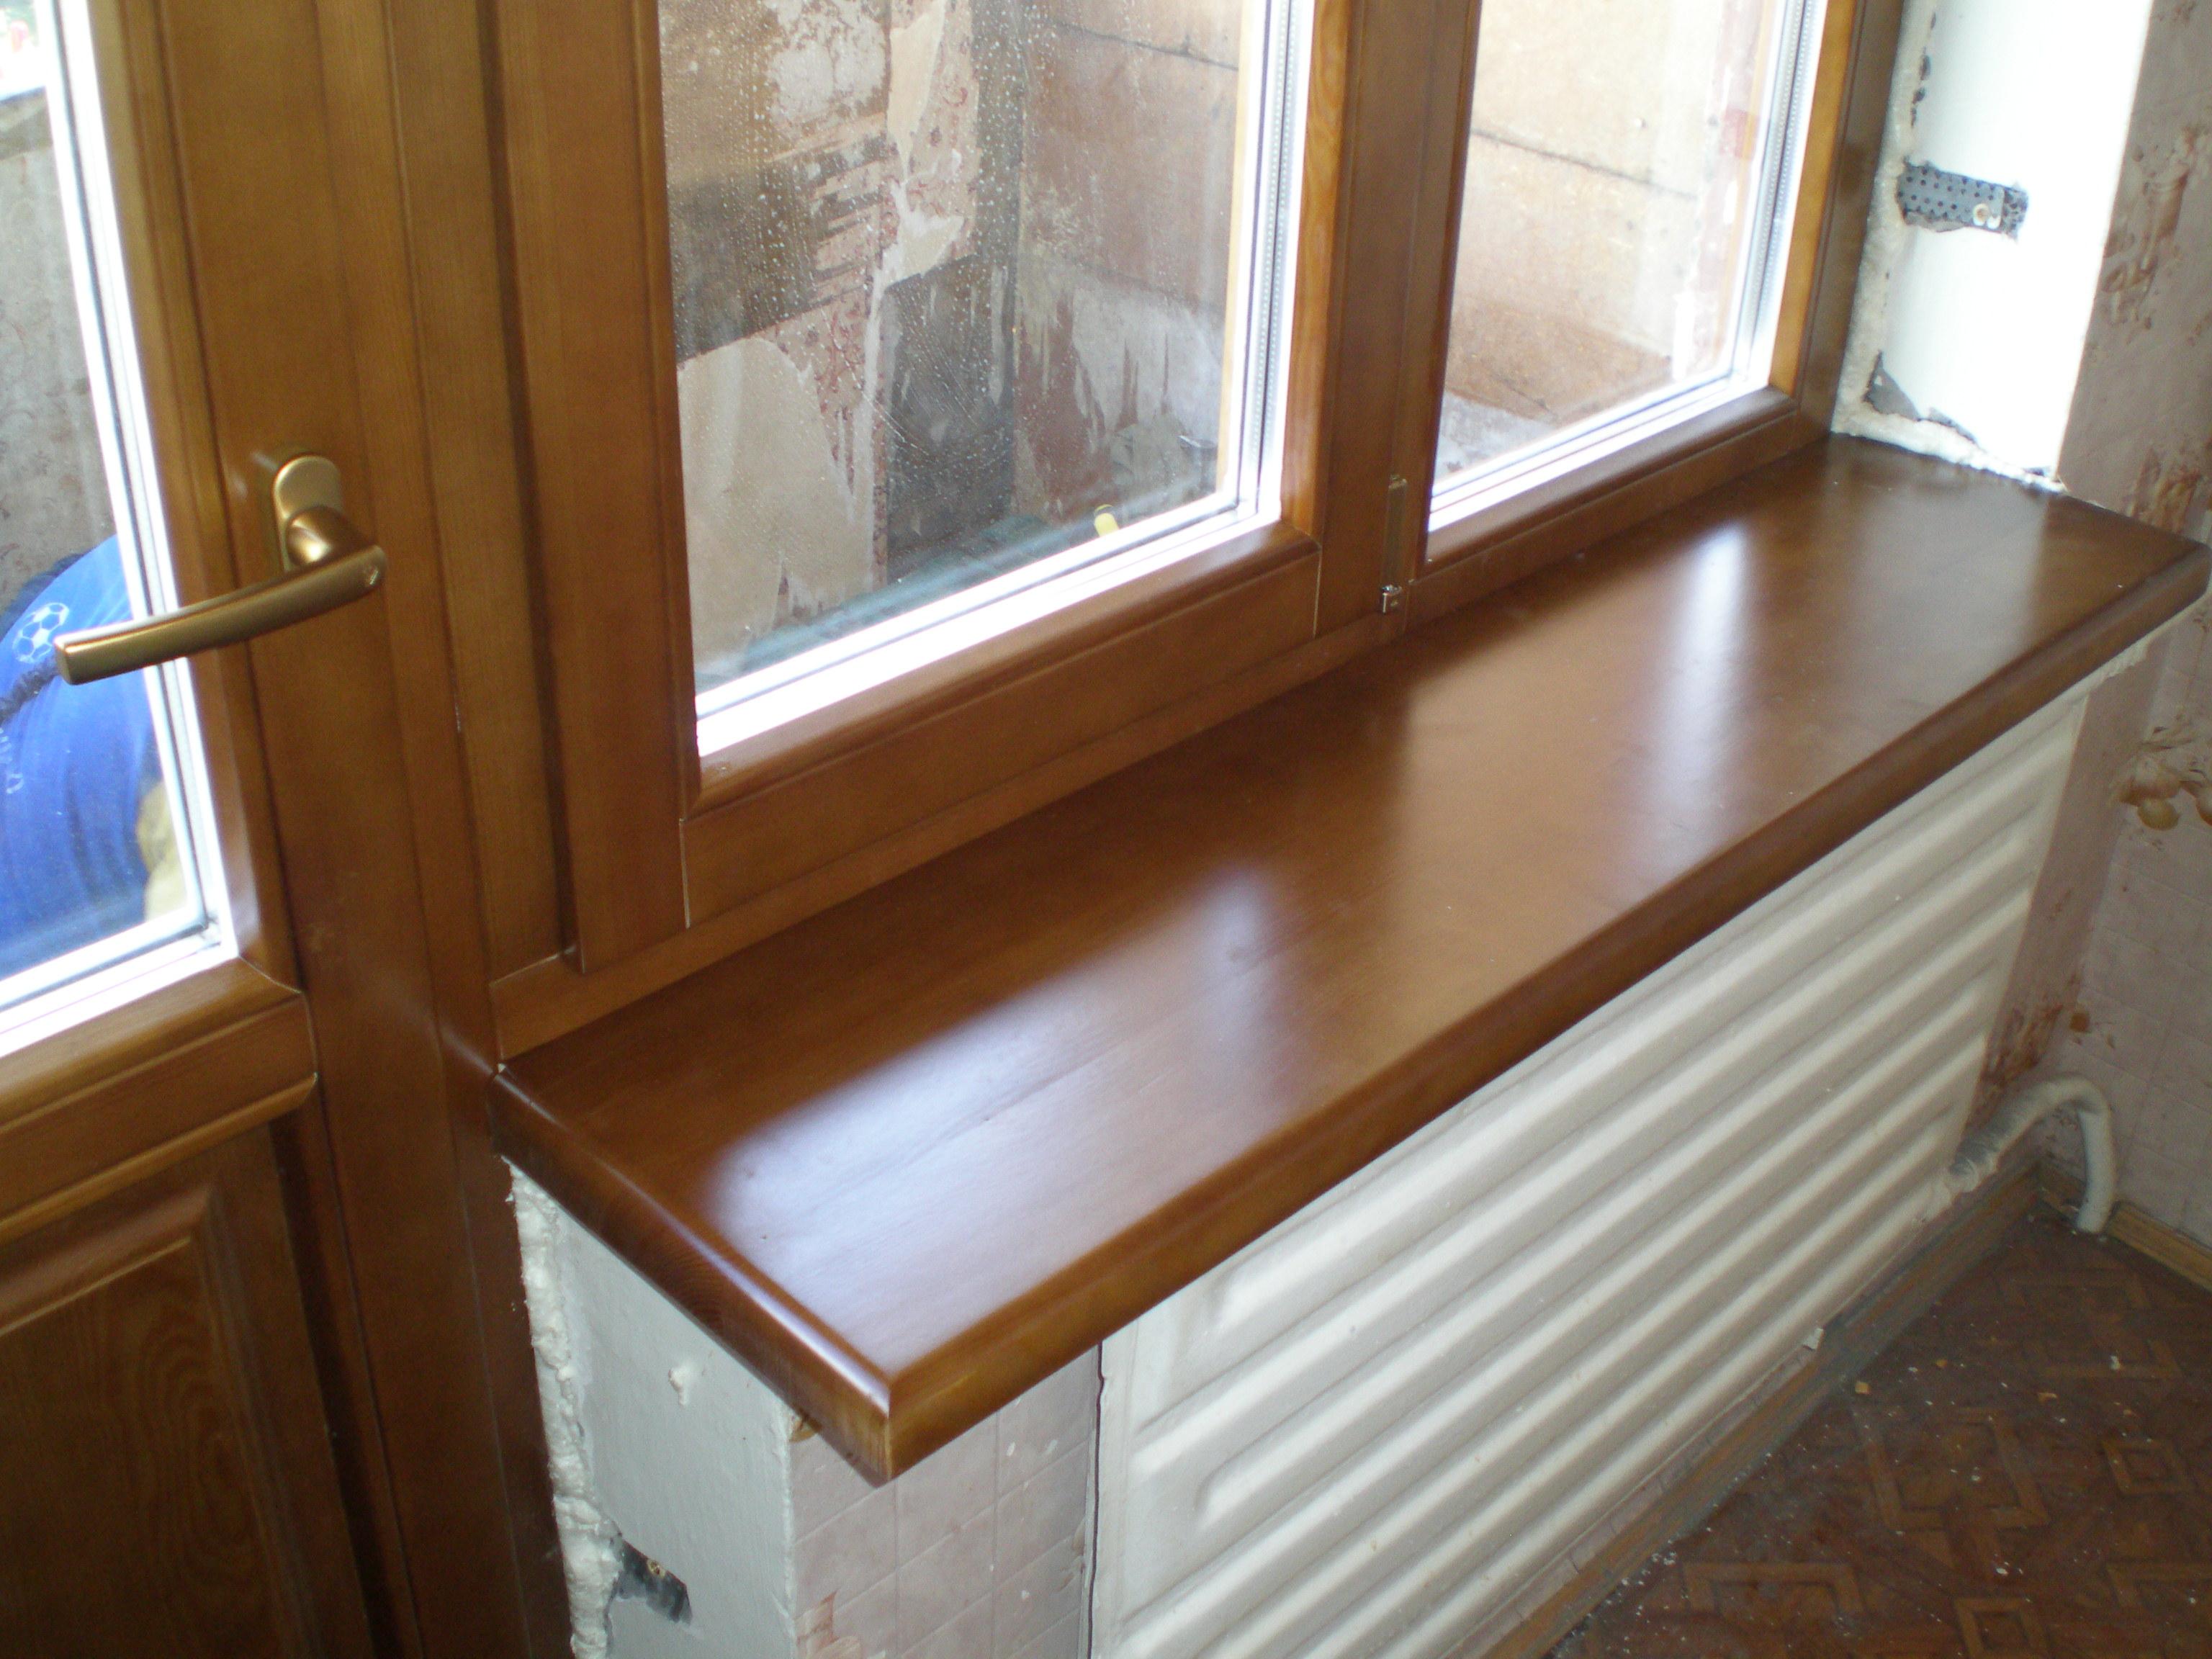 Установка подоконников и откосов на пластиковые окна своими руками 7